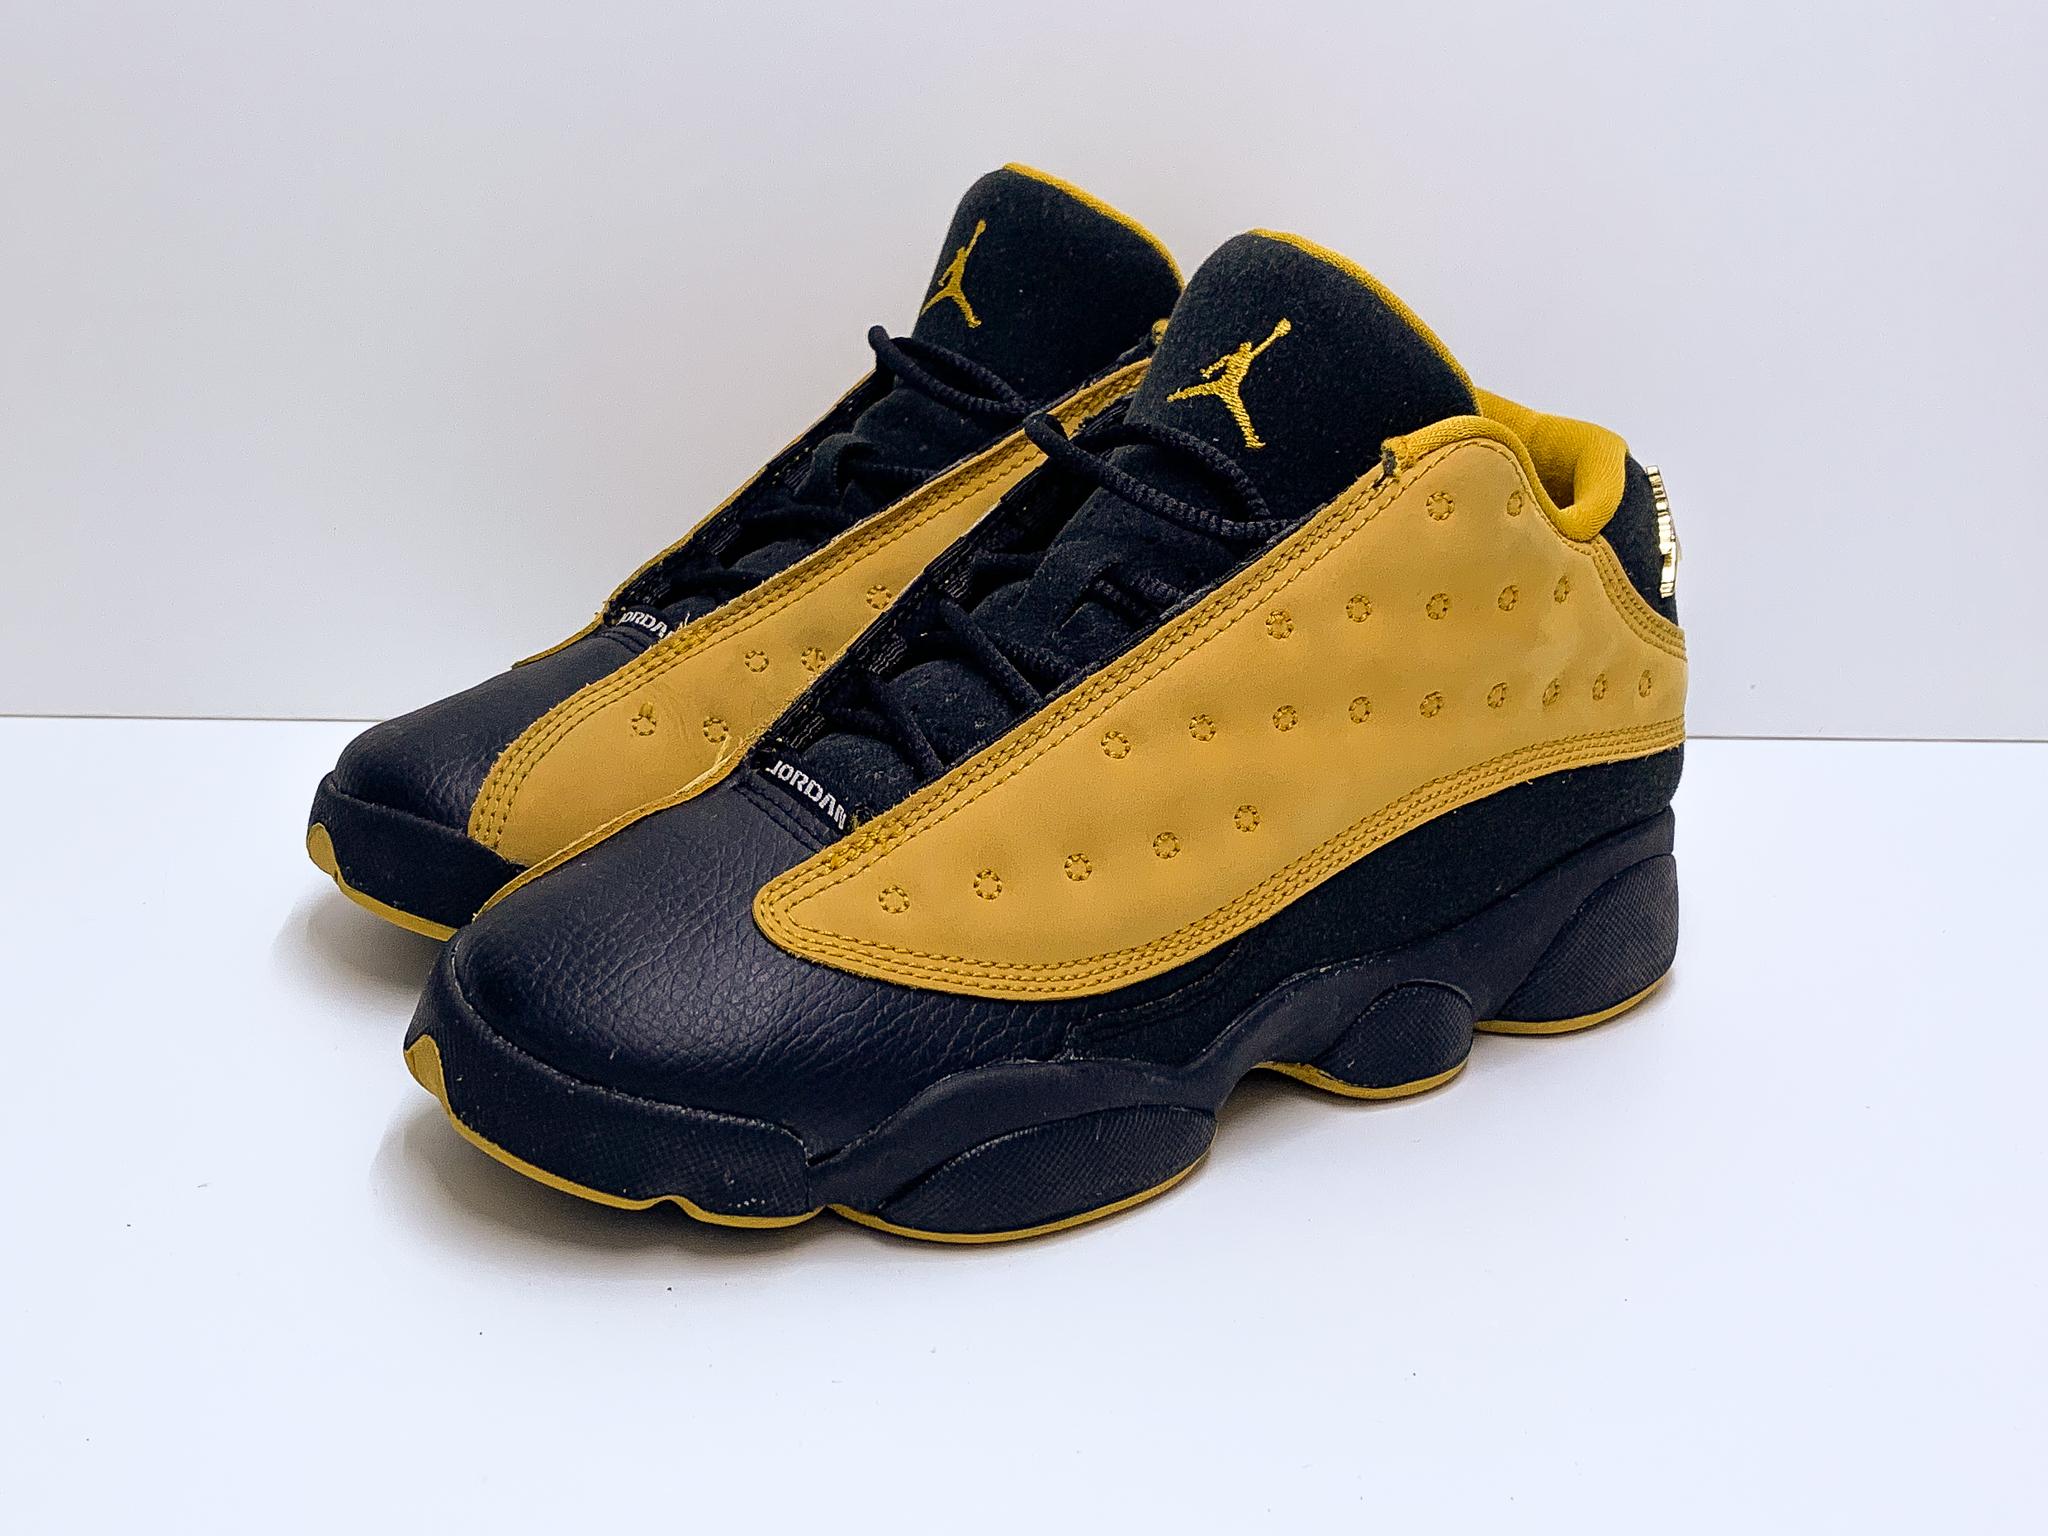 Jordan 13 Retro Low Chutney (GS)